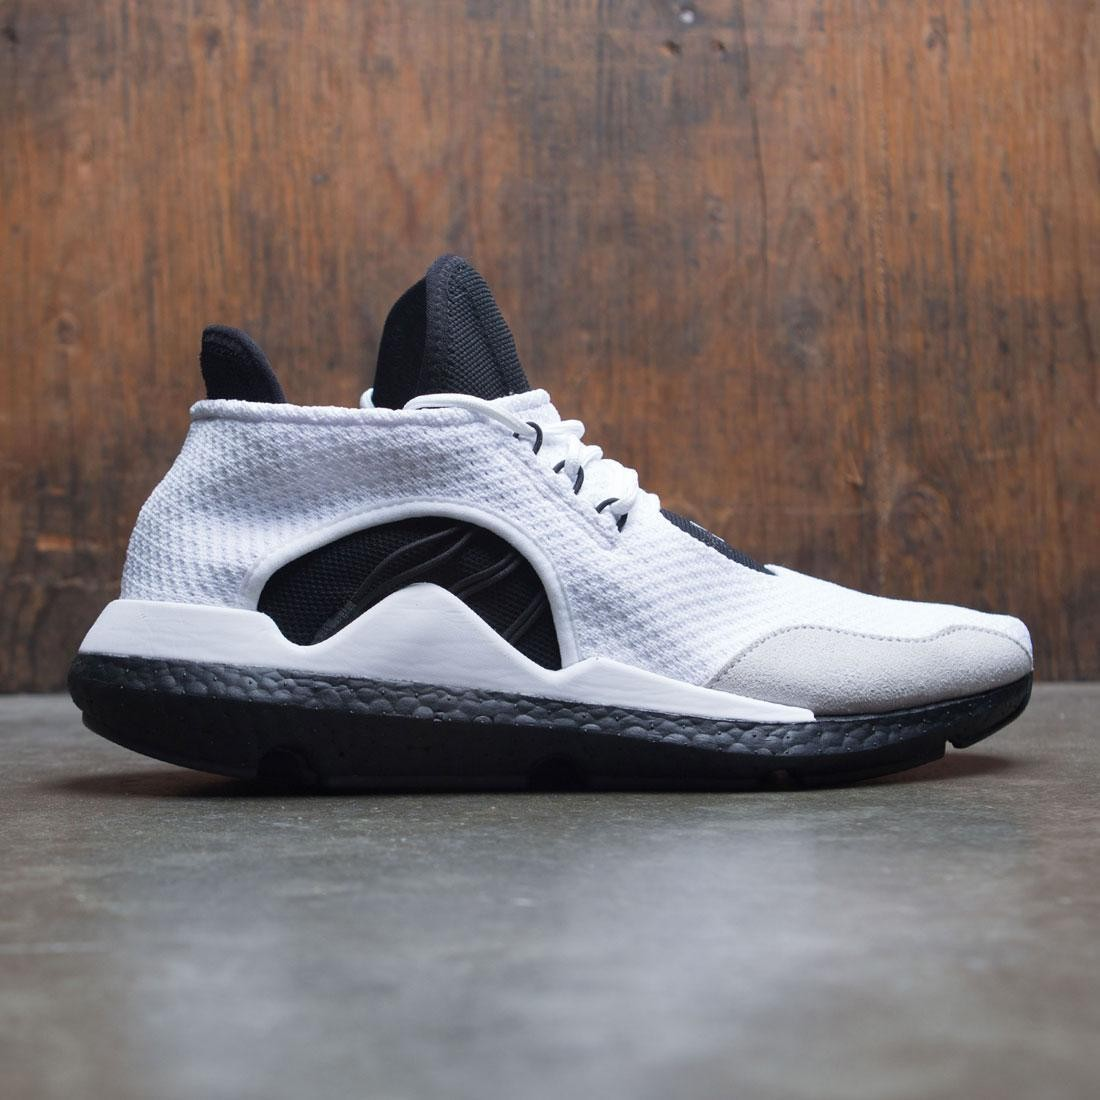 Adidas Y-3 Men Saikou (white / footwear white / black)